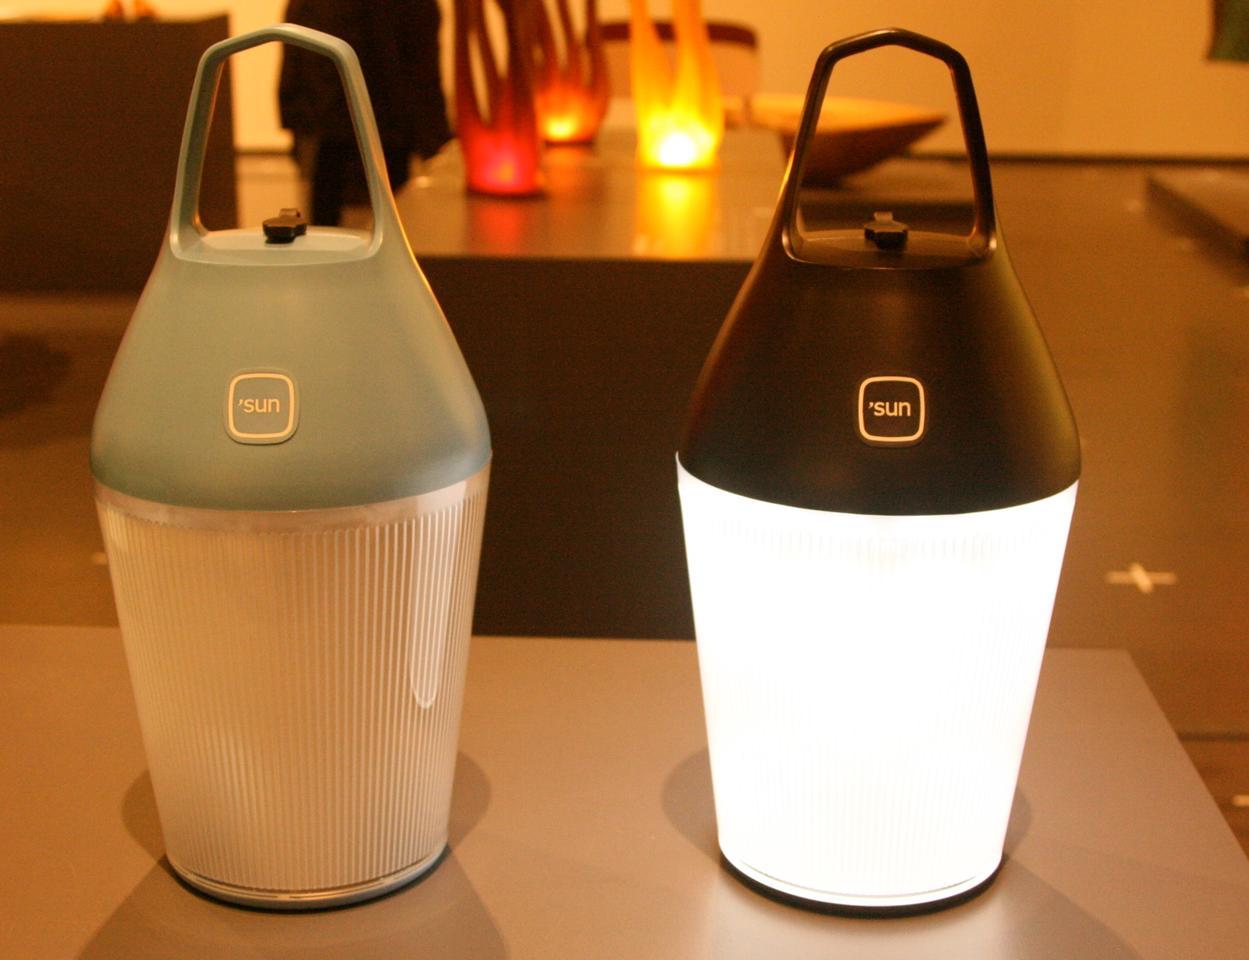 The Nomad lamp design includes a single button for three different lighting settings (Photo: Bridget Borgobello/Gizmag)